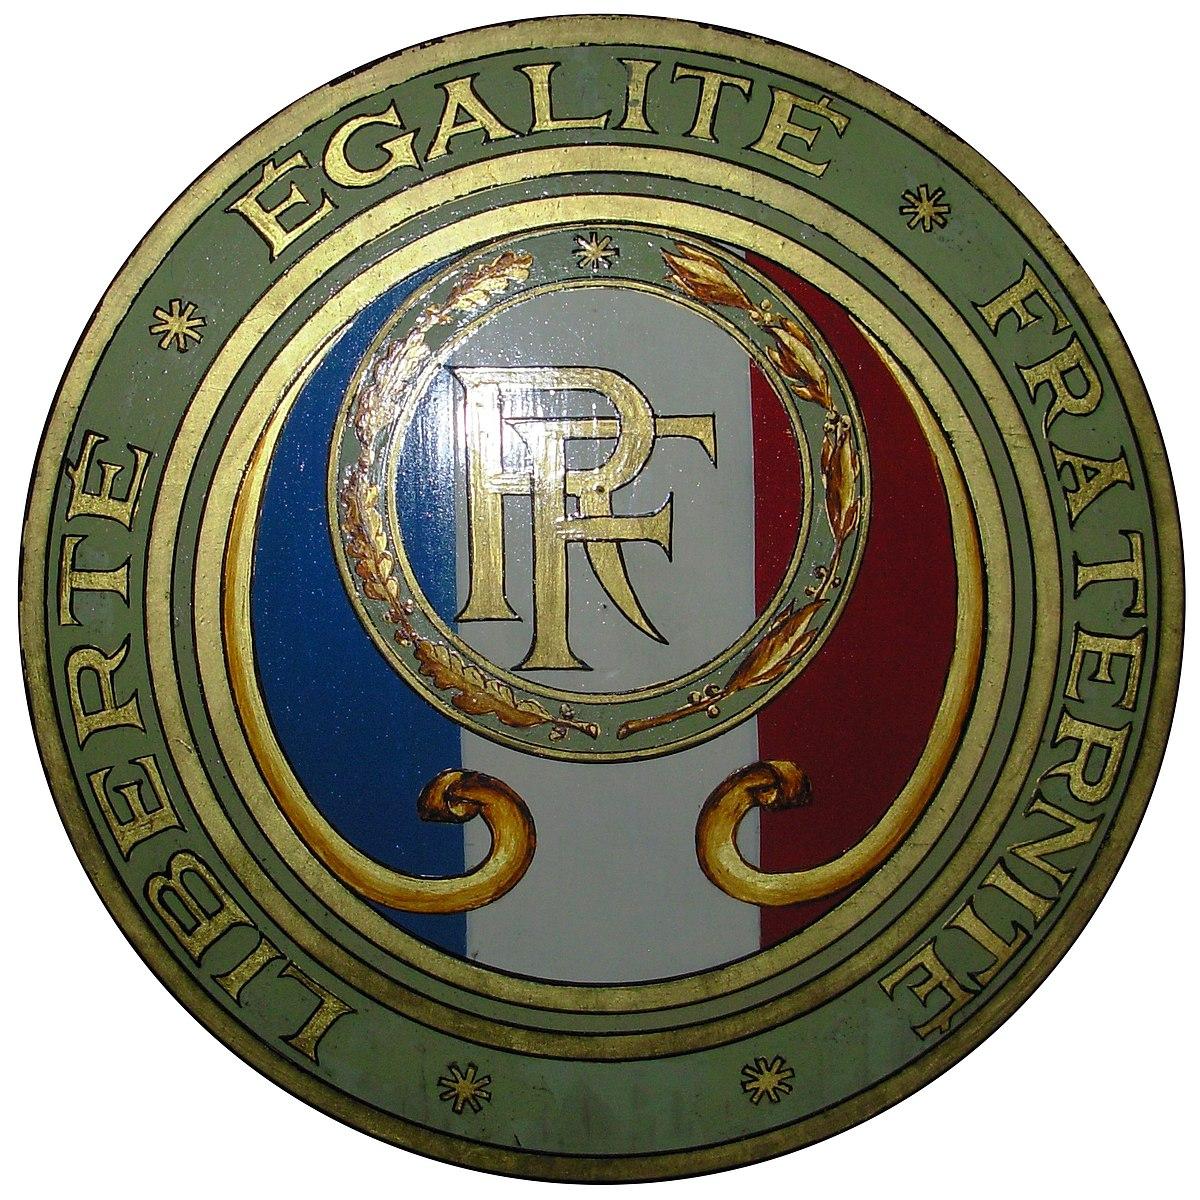 Libert galit fraternit wikipedia la enciclopedia for Republica francesa wikipedia